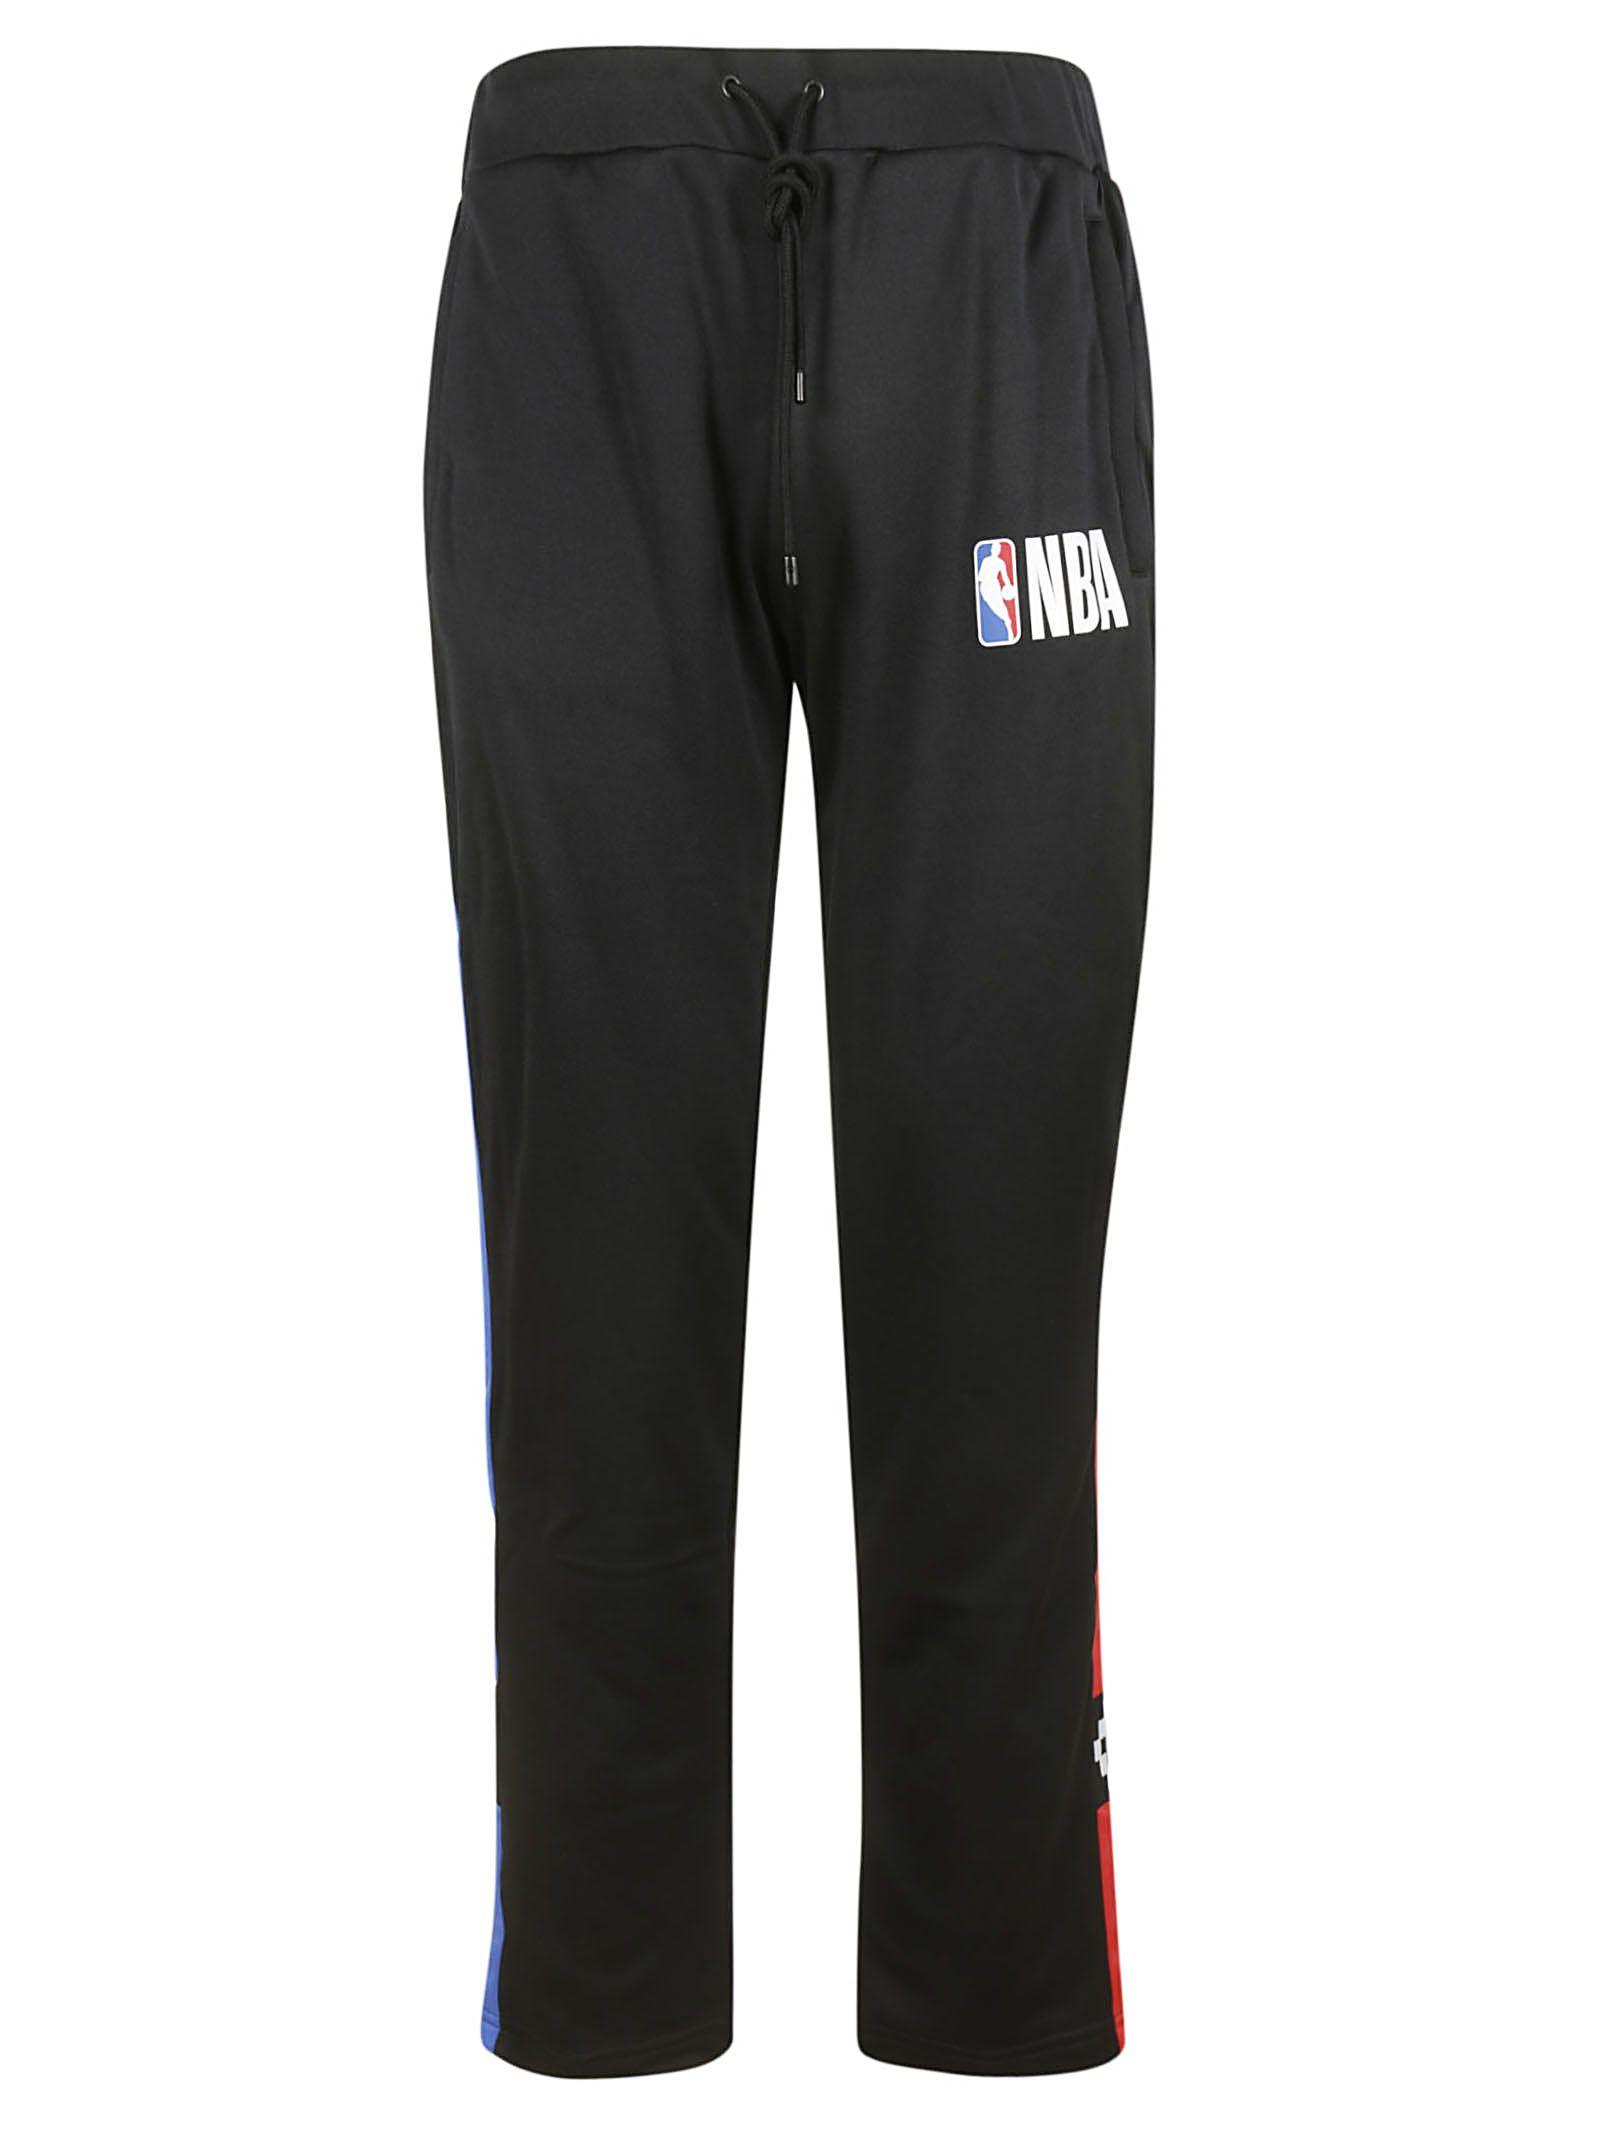 NBA TRACK PANTS from Italist.com